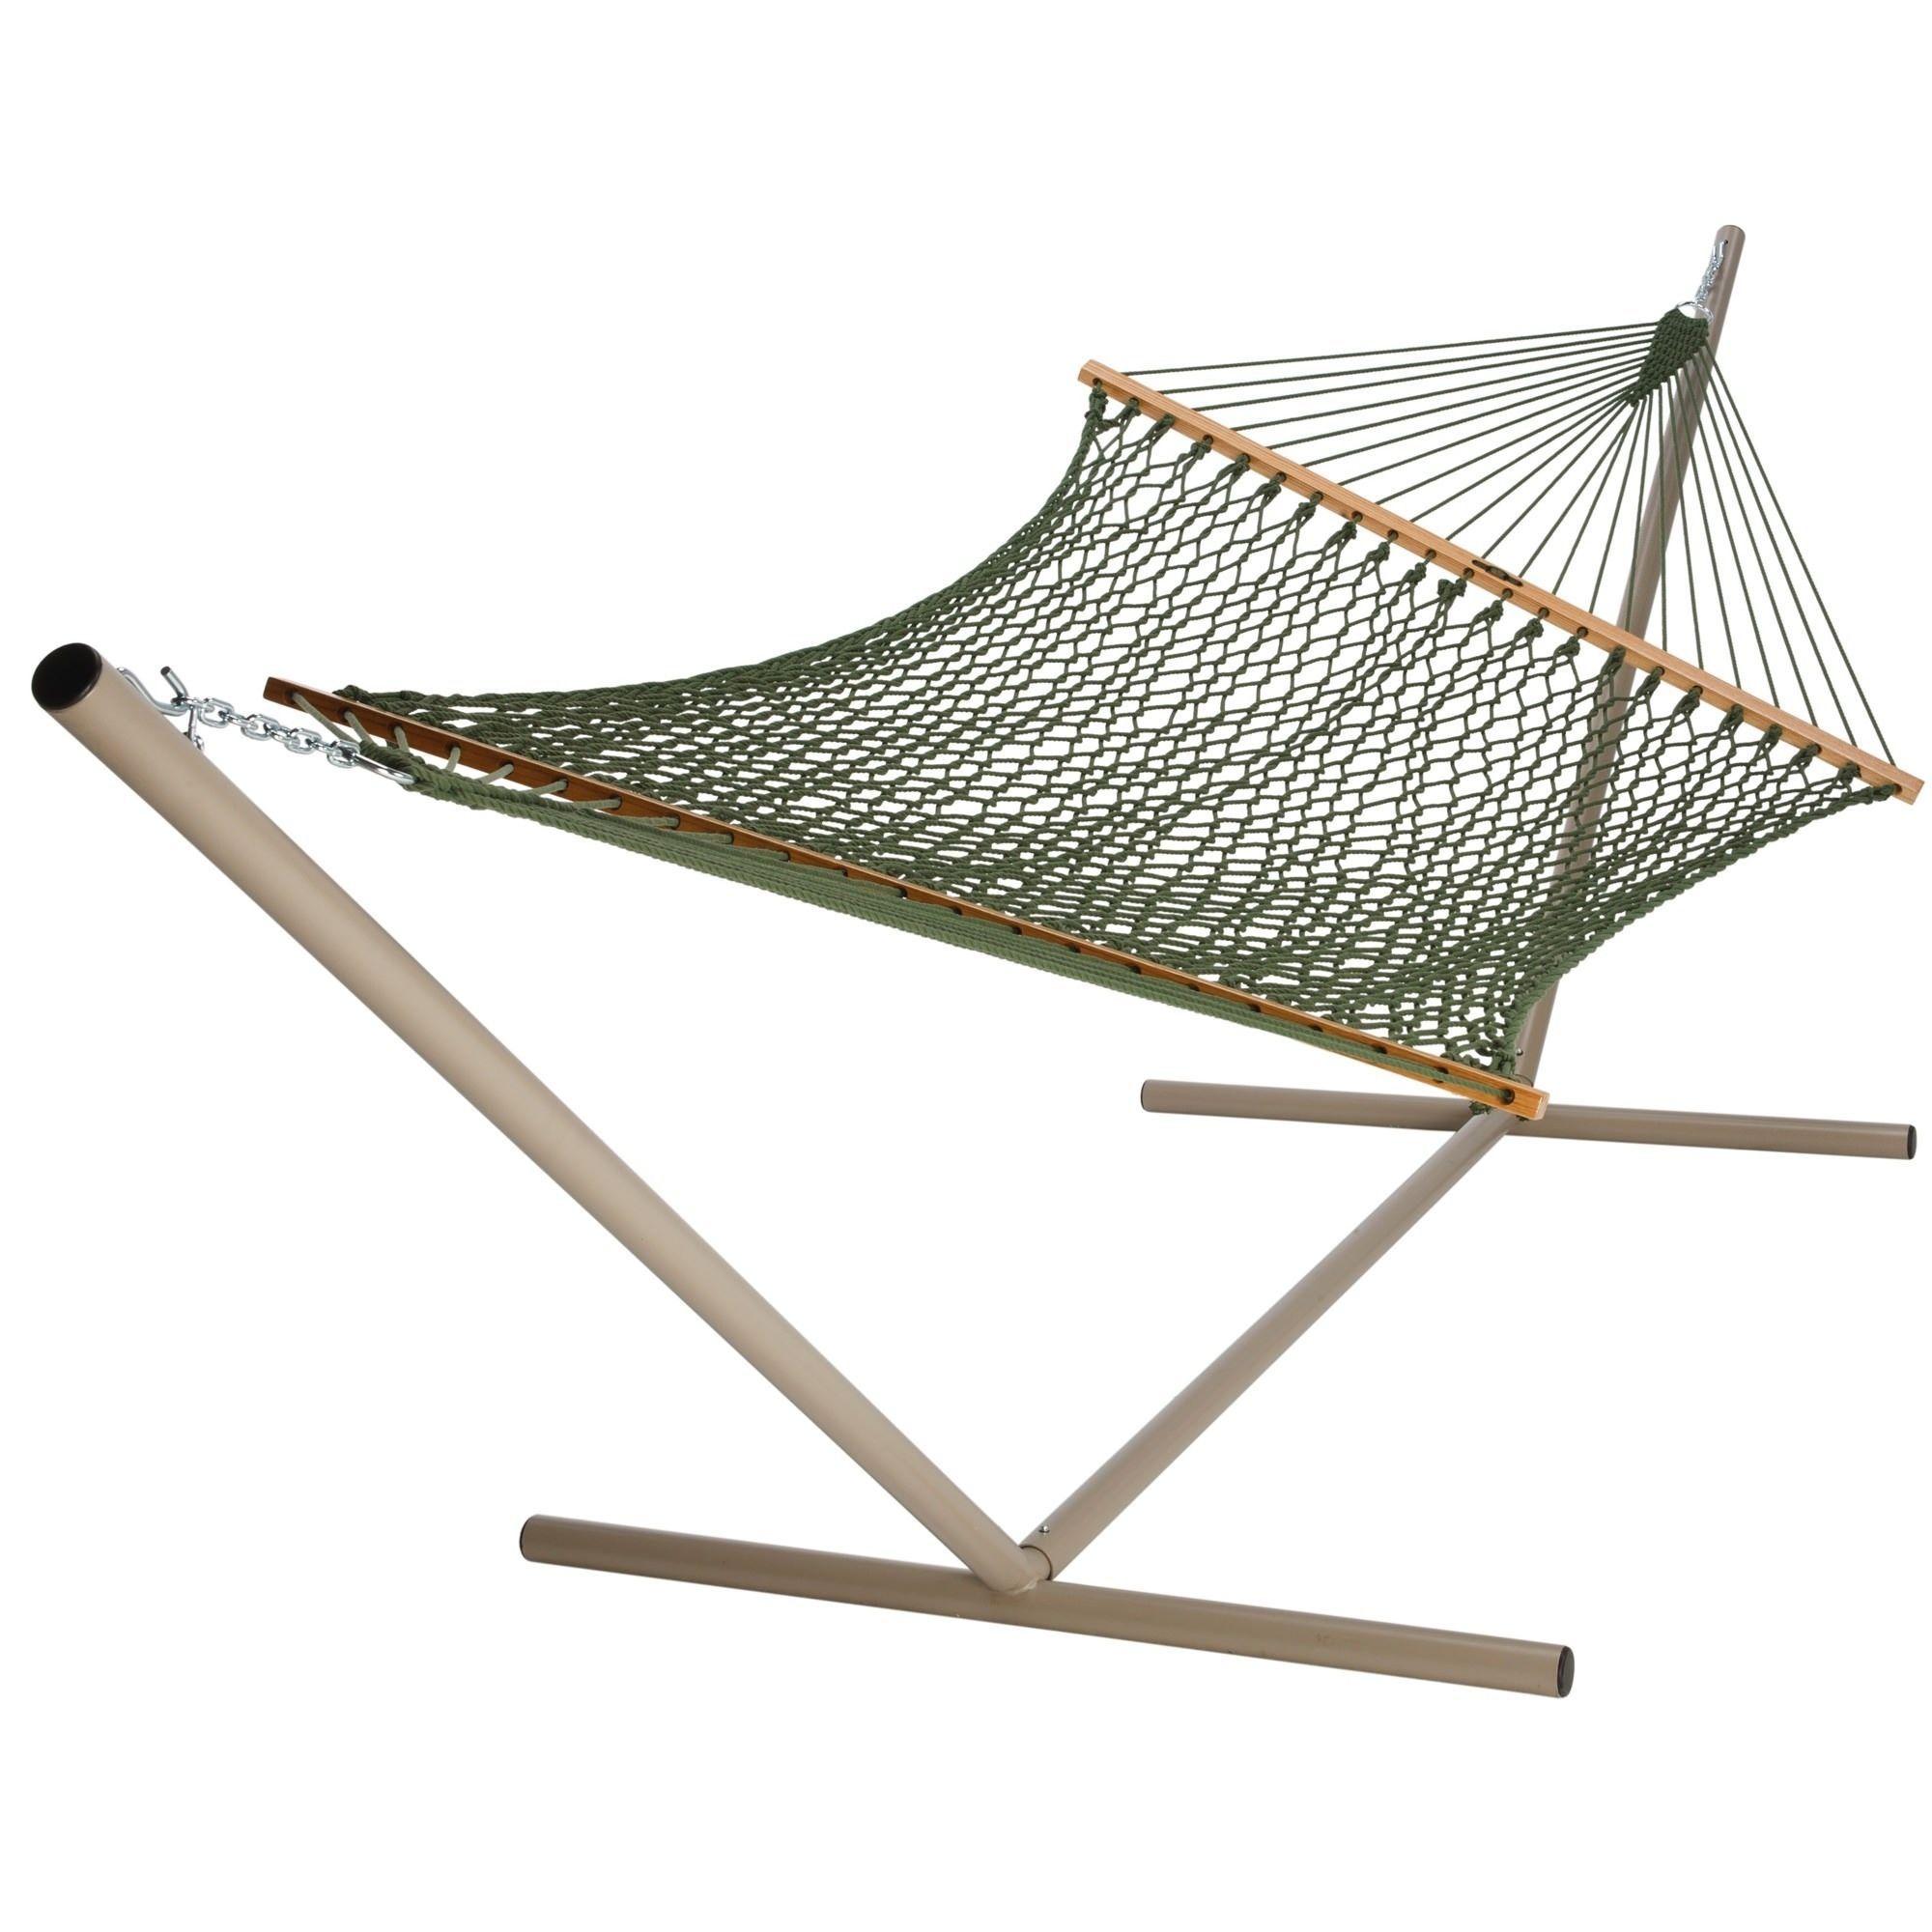 island chair nicolasprudhon stand wooden indoor hammock tent com sale rei pawleys furniture